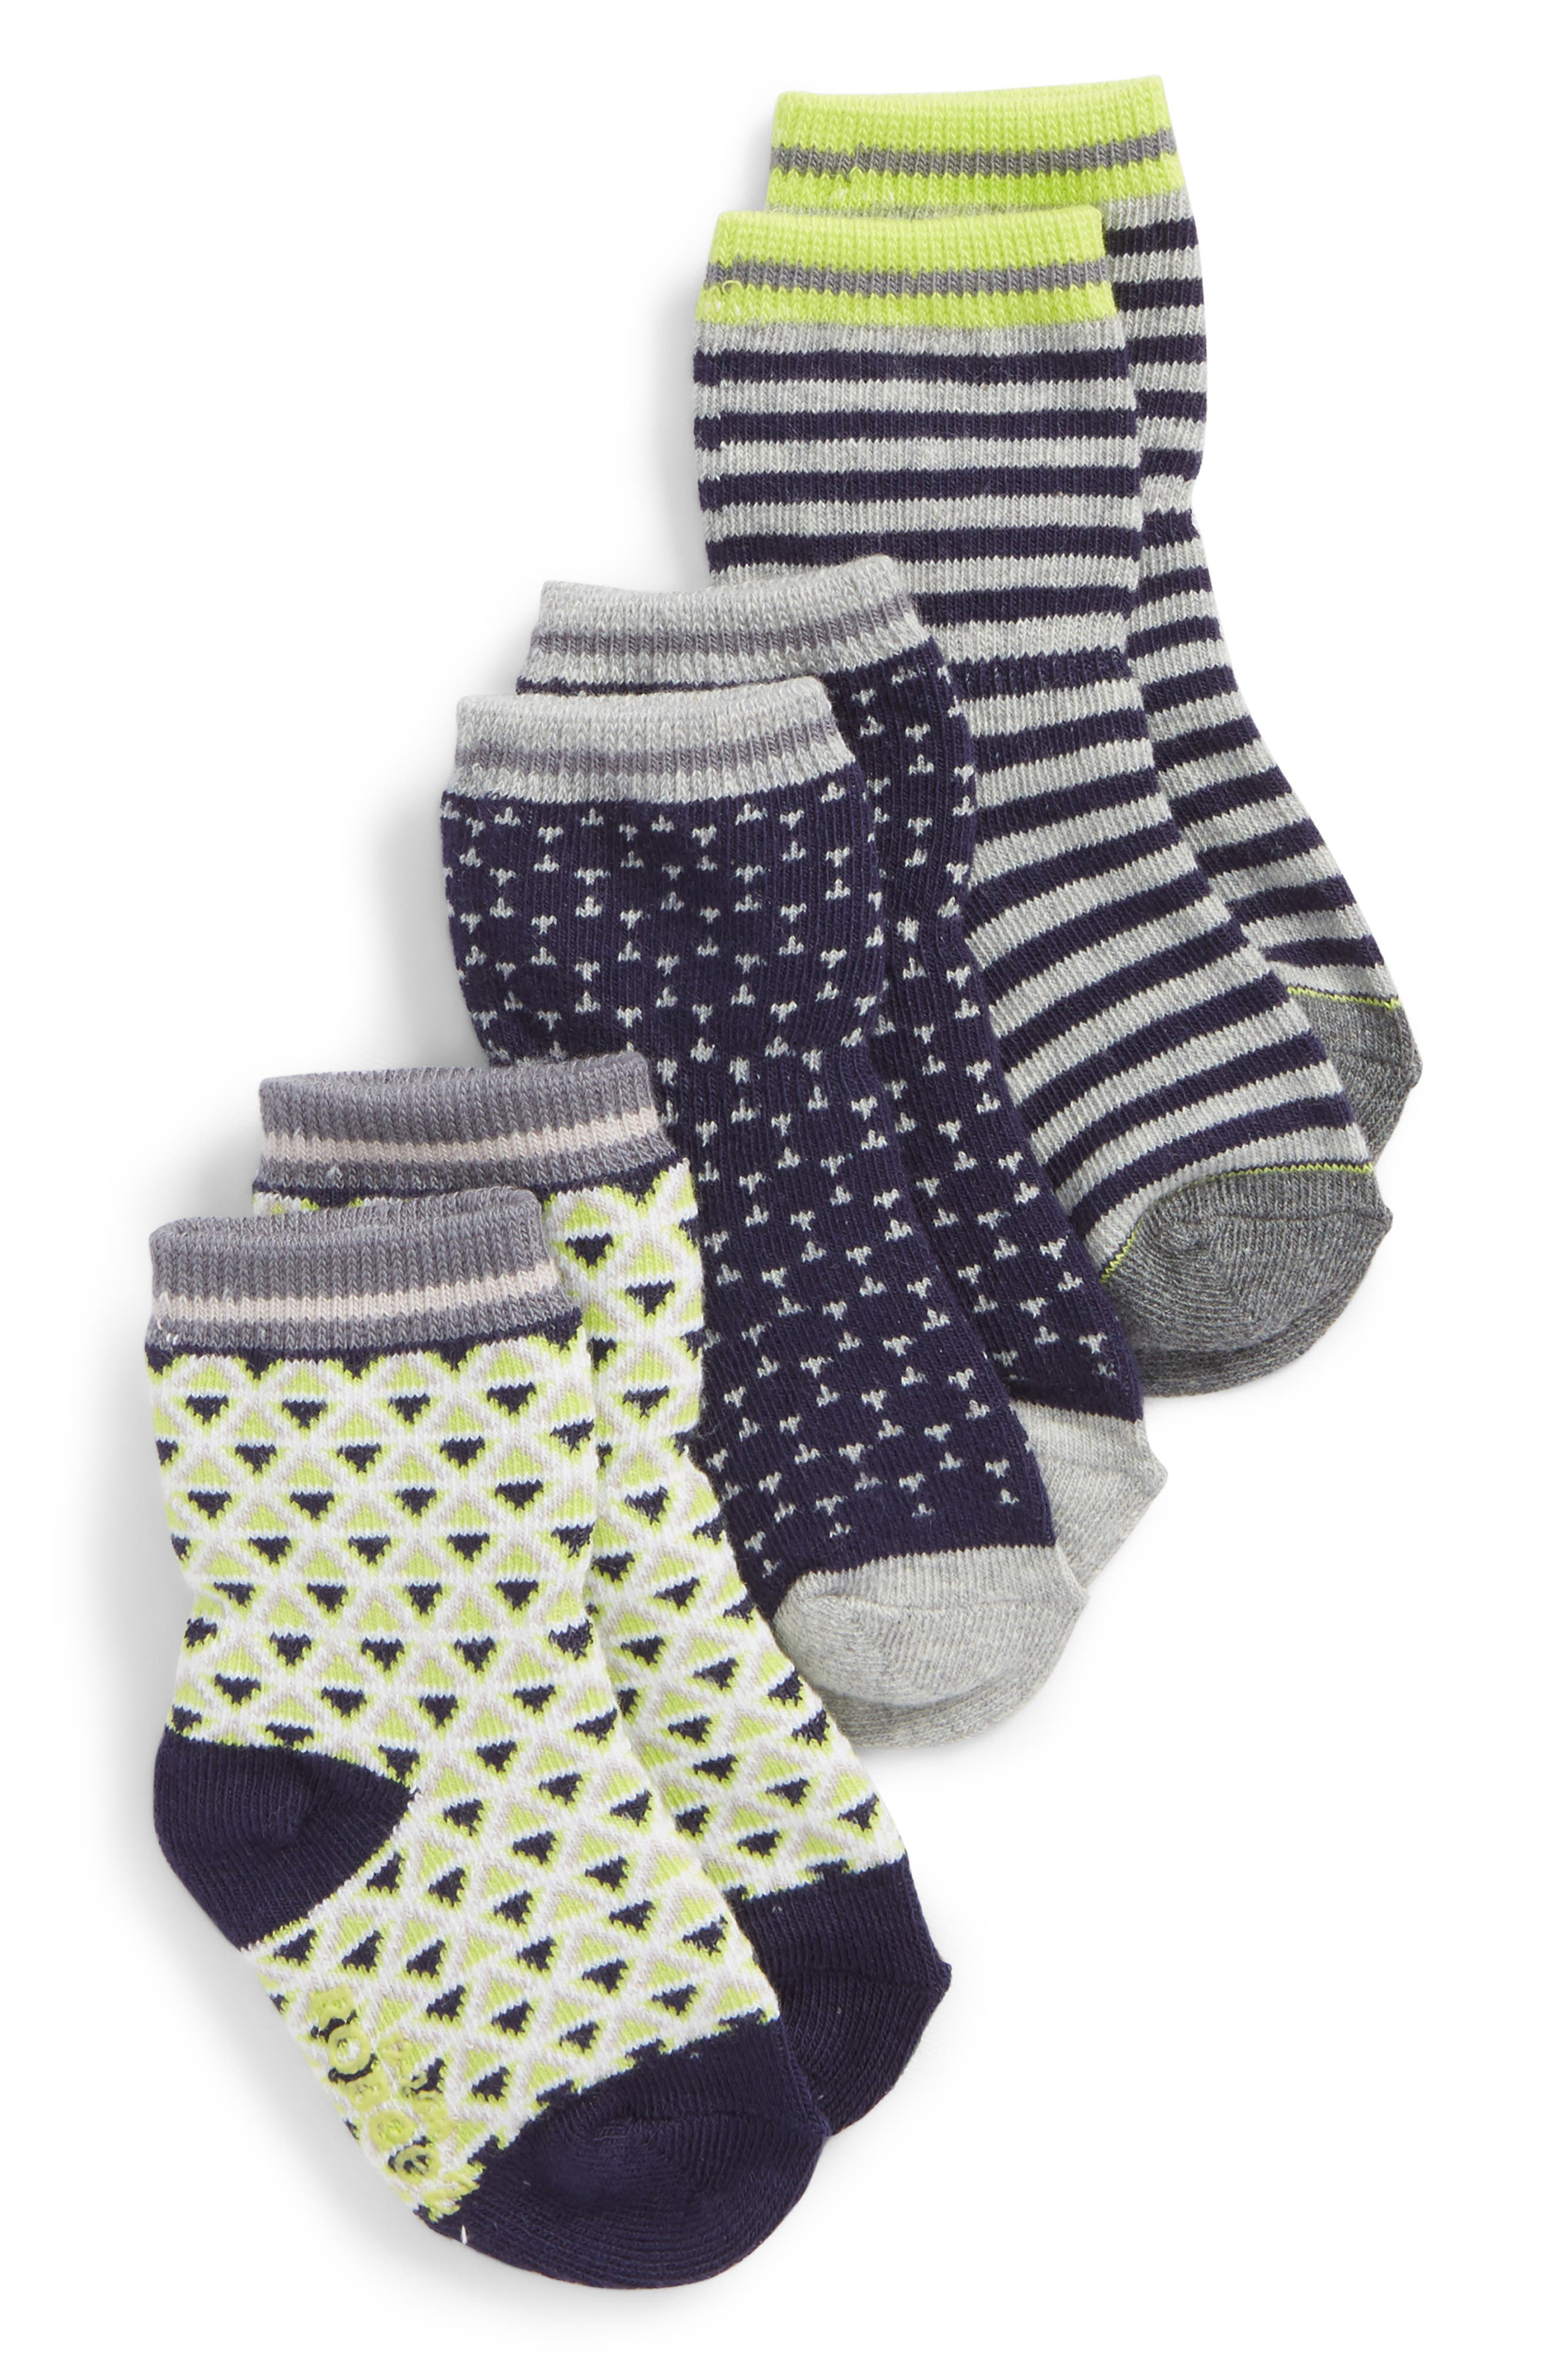 Geo 3-Pack Socks,                         Main,                         color, Gray/ Navy/ Lime